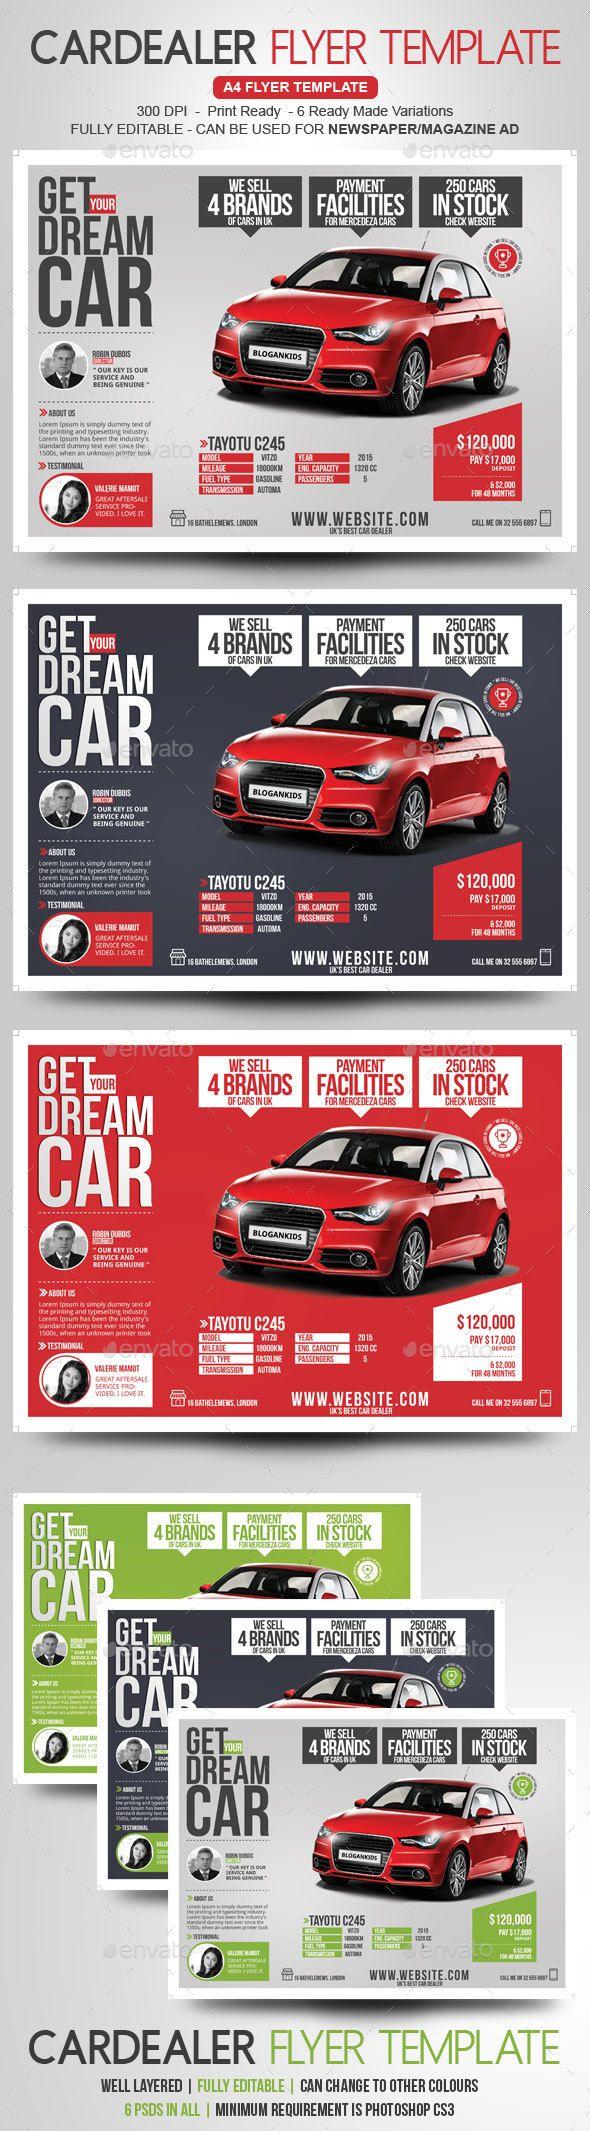 car ad template